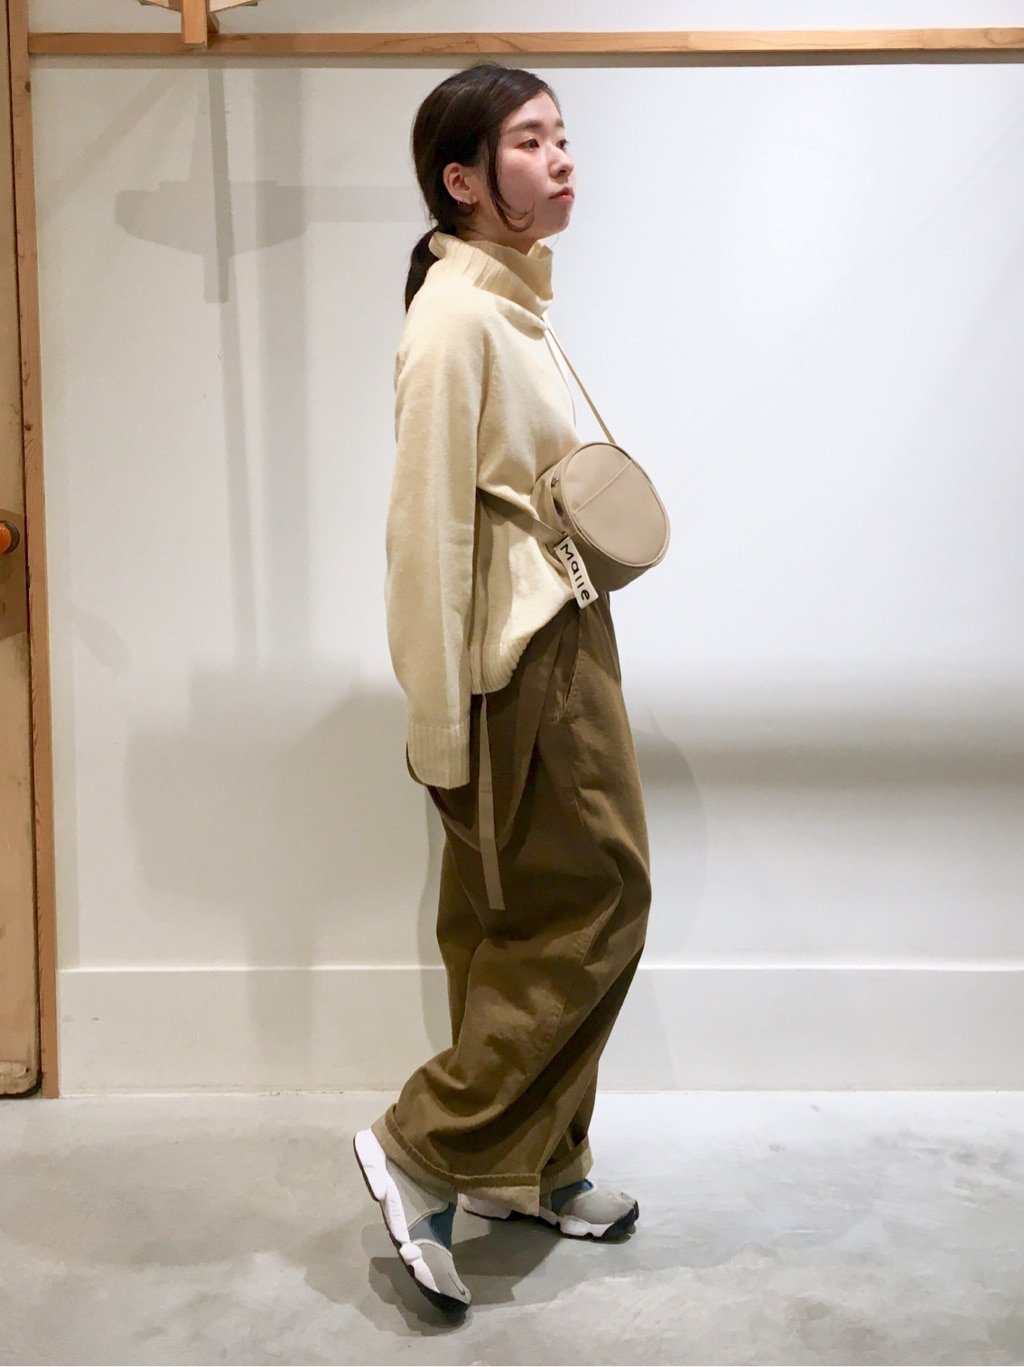 Malle chambre de charme 調布パルコ 身長:152cm 2020.10.26